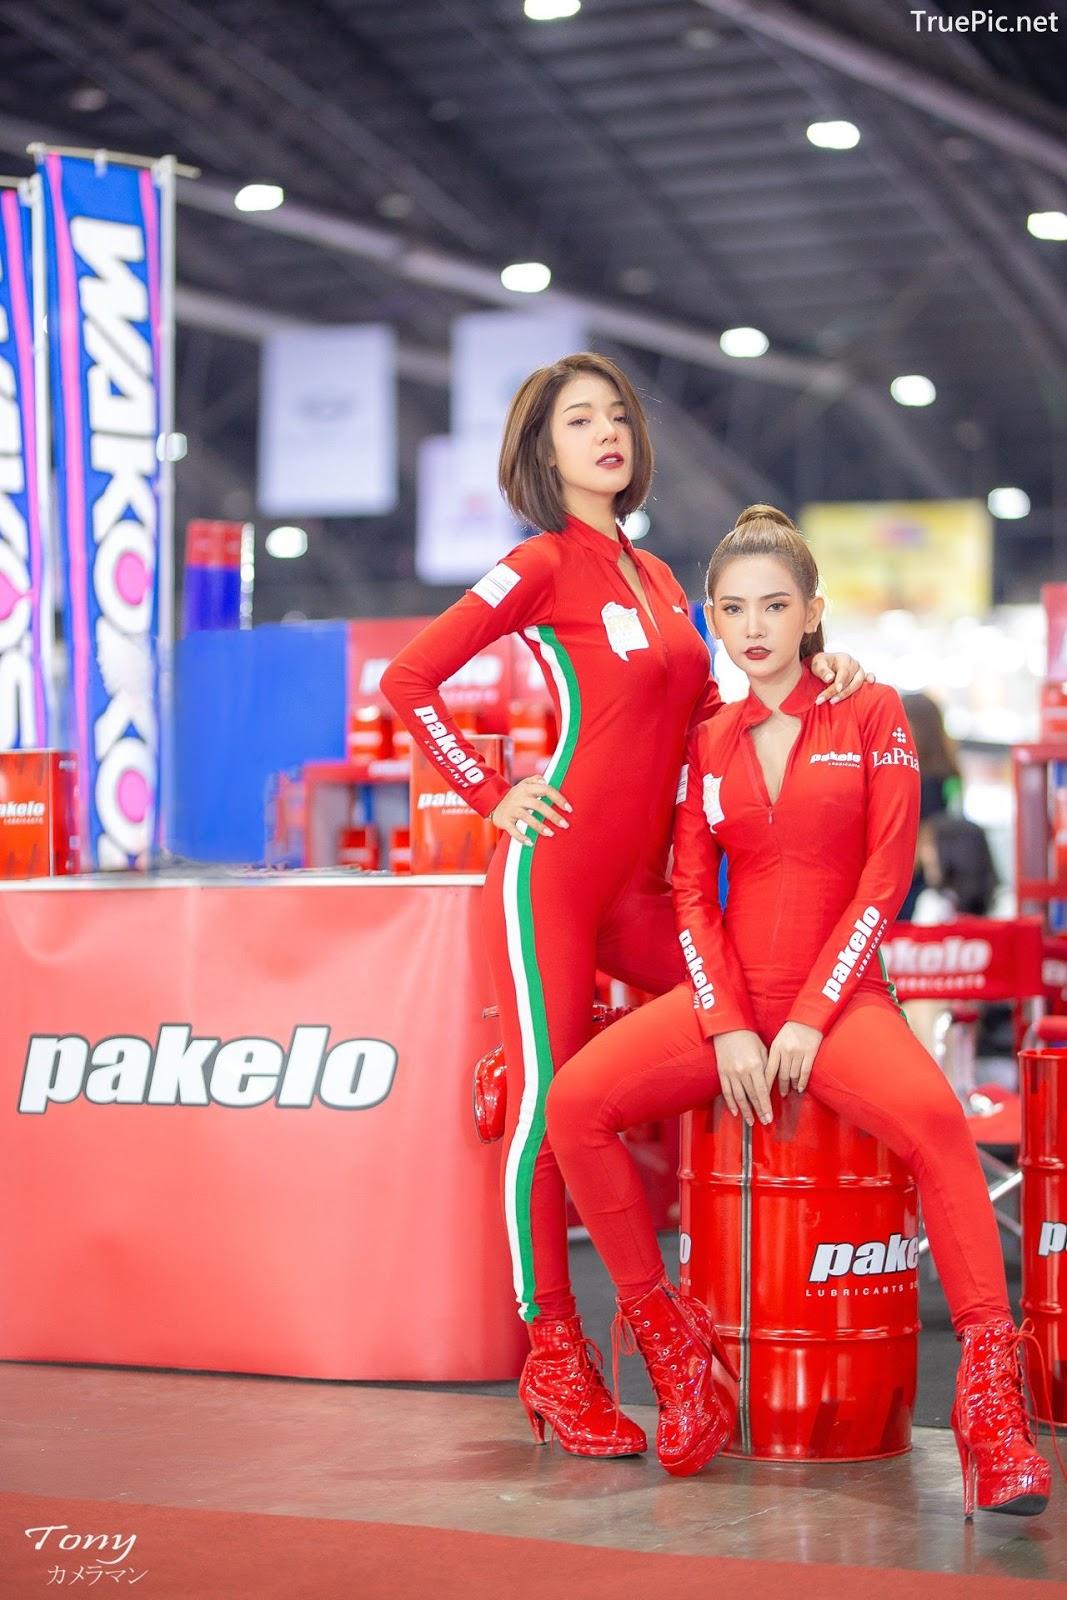 Image-Thailand-Hot-Model-Thai-Racing-Girl-At-Bangkok-Auto-Salon-2019-TruePic.net- Picture-3